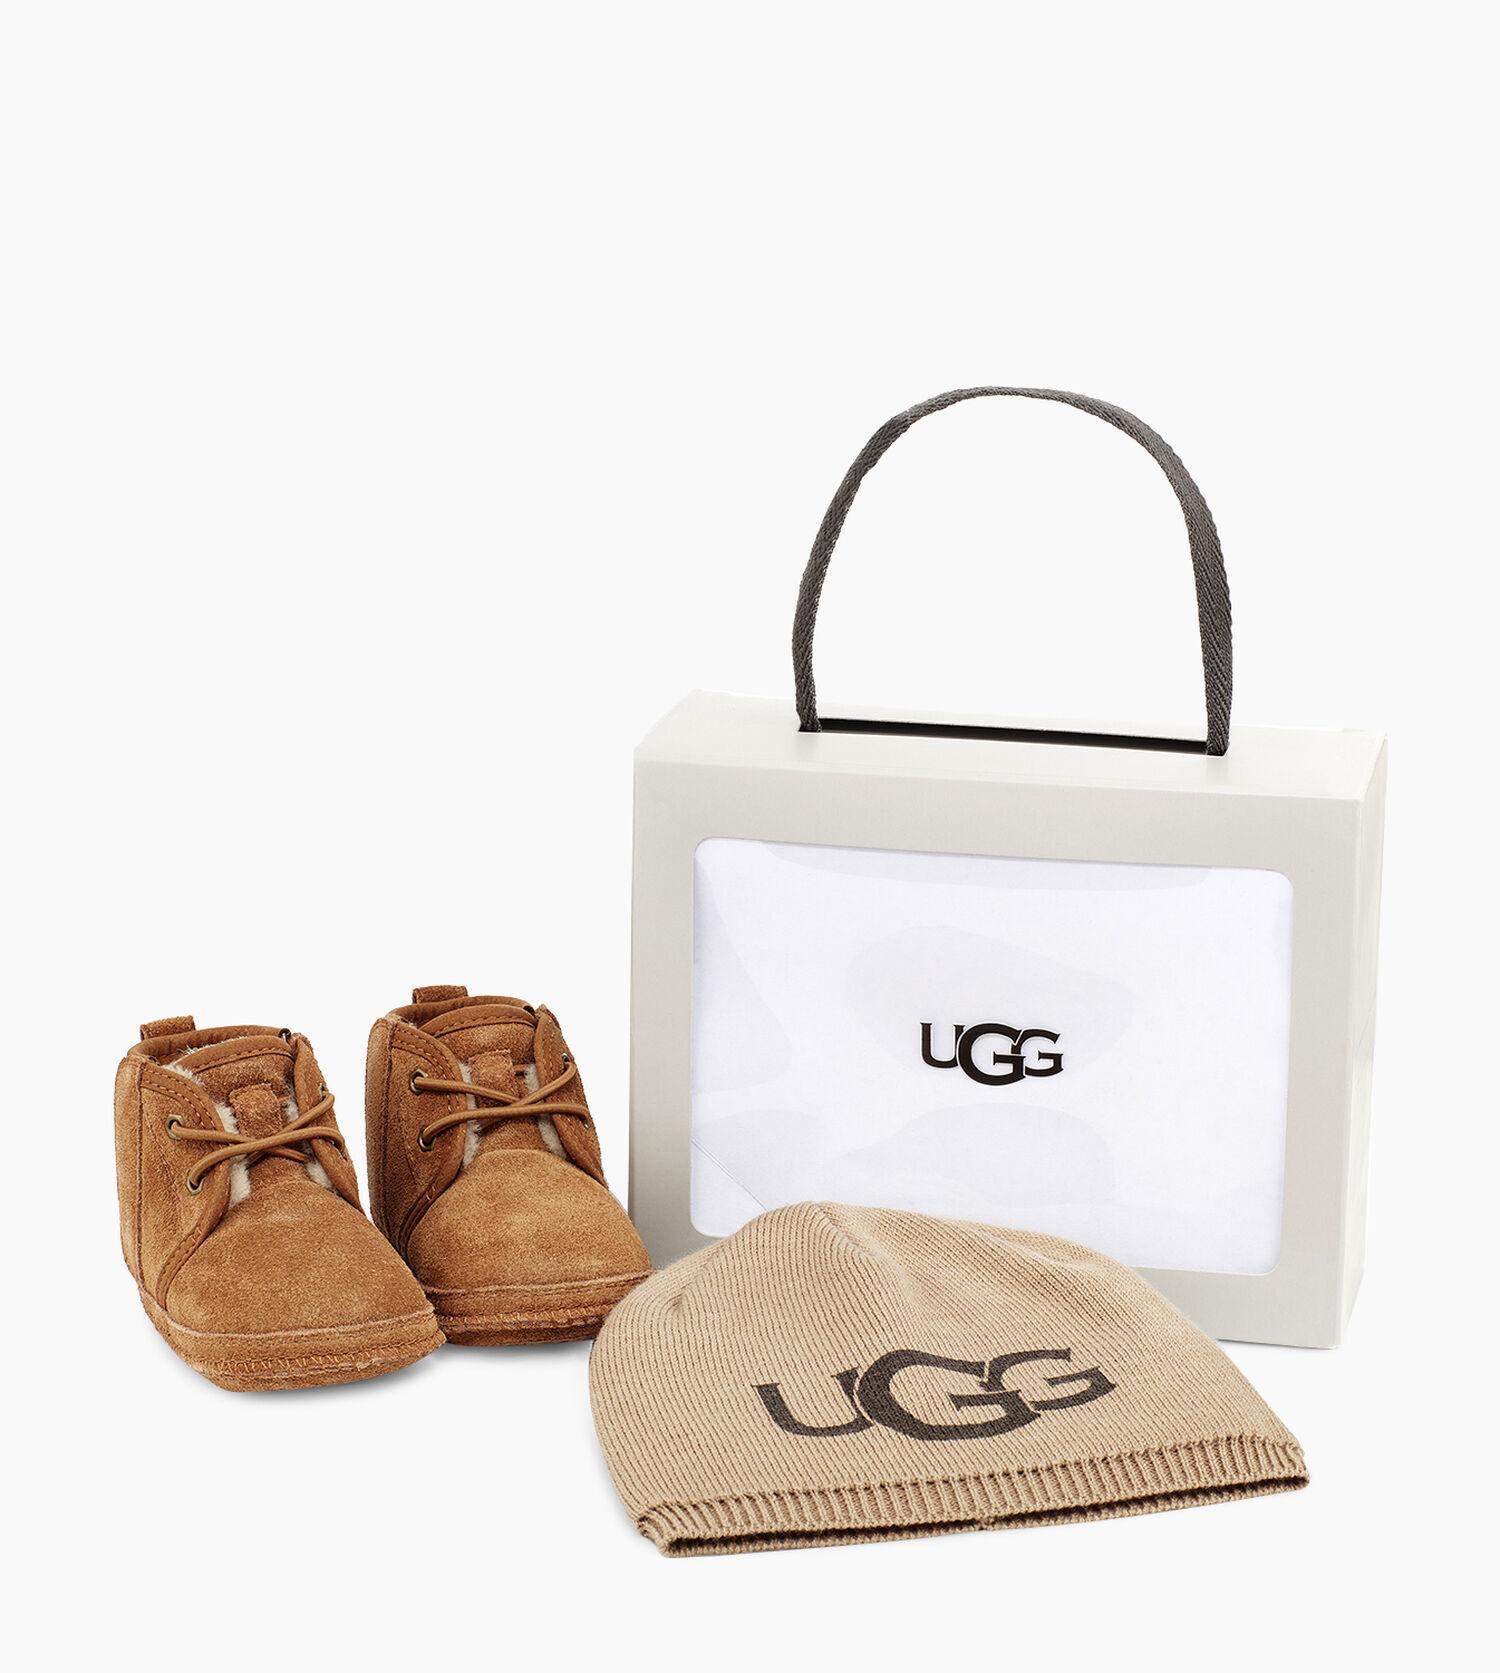 Kids' Baby Neumel \u0026 UGG Beanie Boot